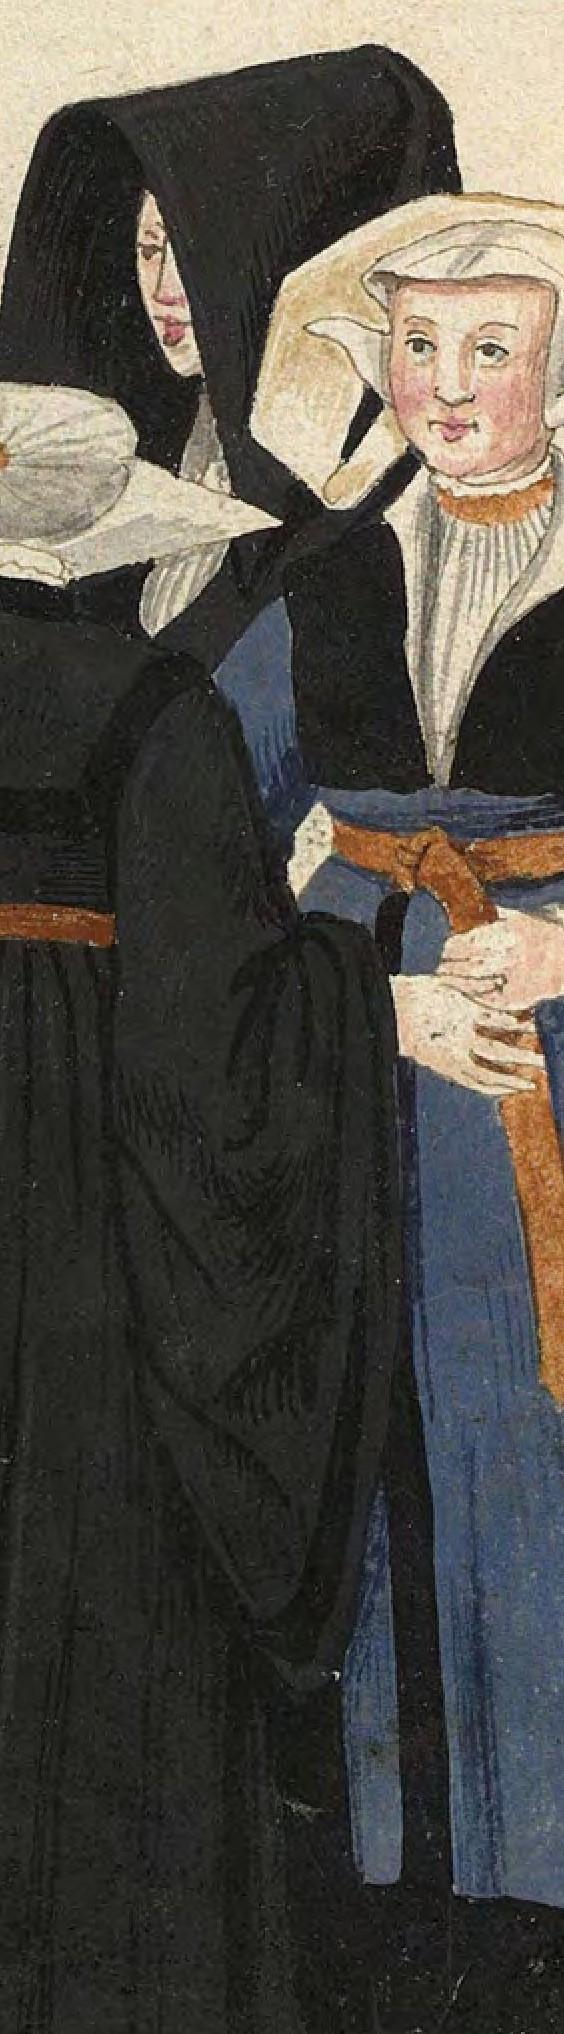 1540s Cologne Burger. Fig. 4, plate 45r, Codice de trajes, Christoph Weiditz. BNE bdh0000052132